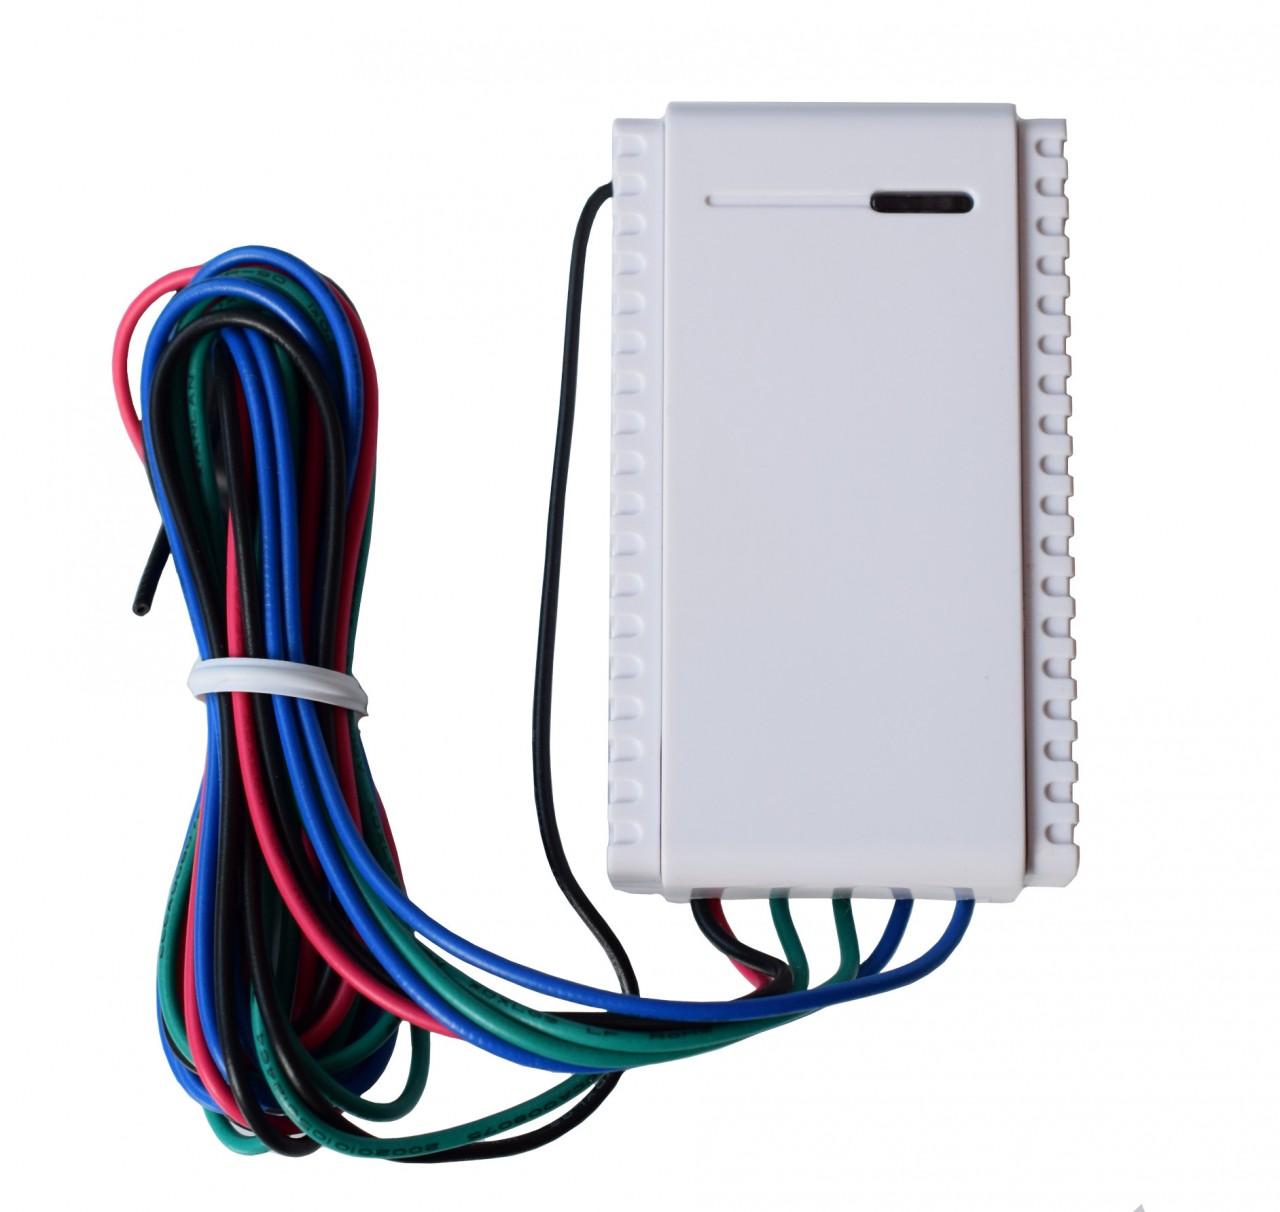 Schartec Universal Mini-Funkempfänger 433 MHz Rolling-Code